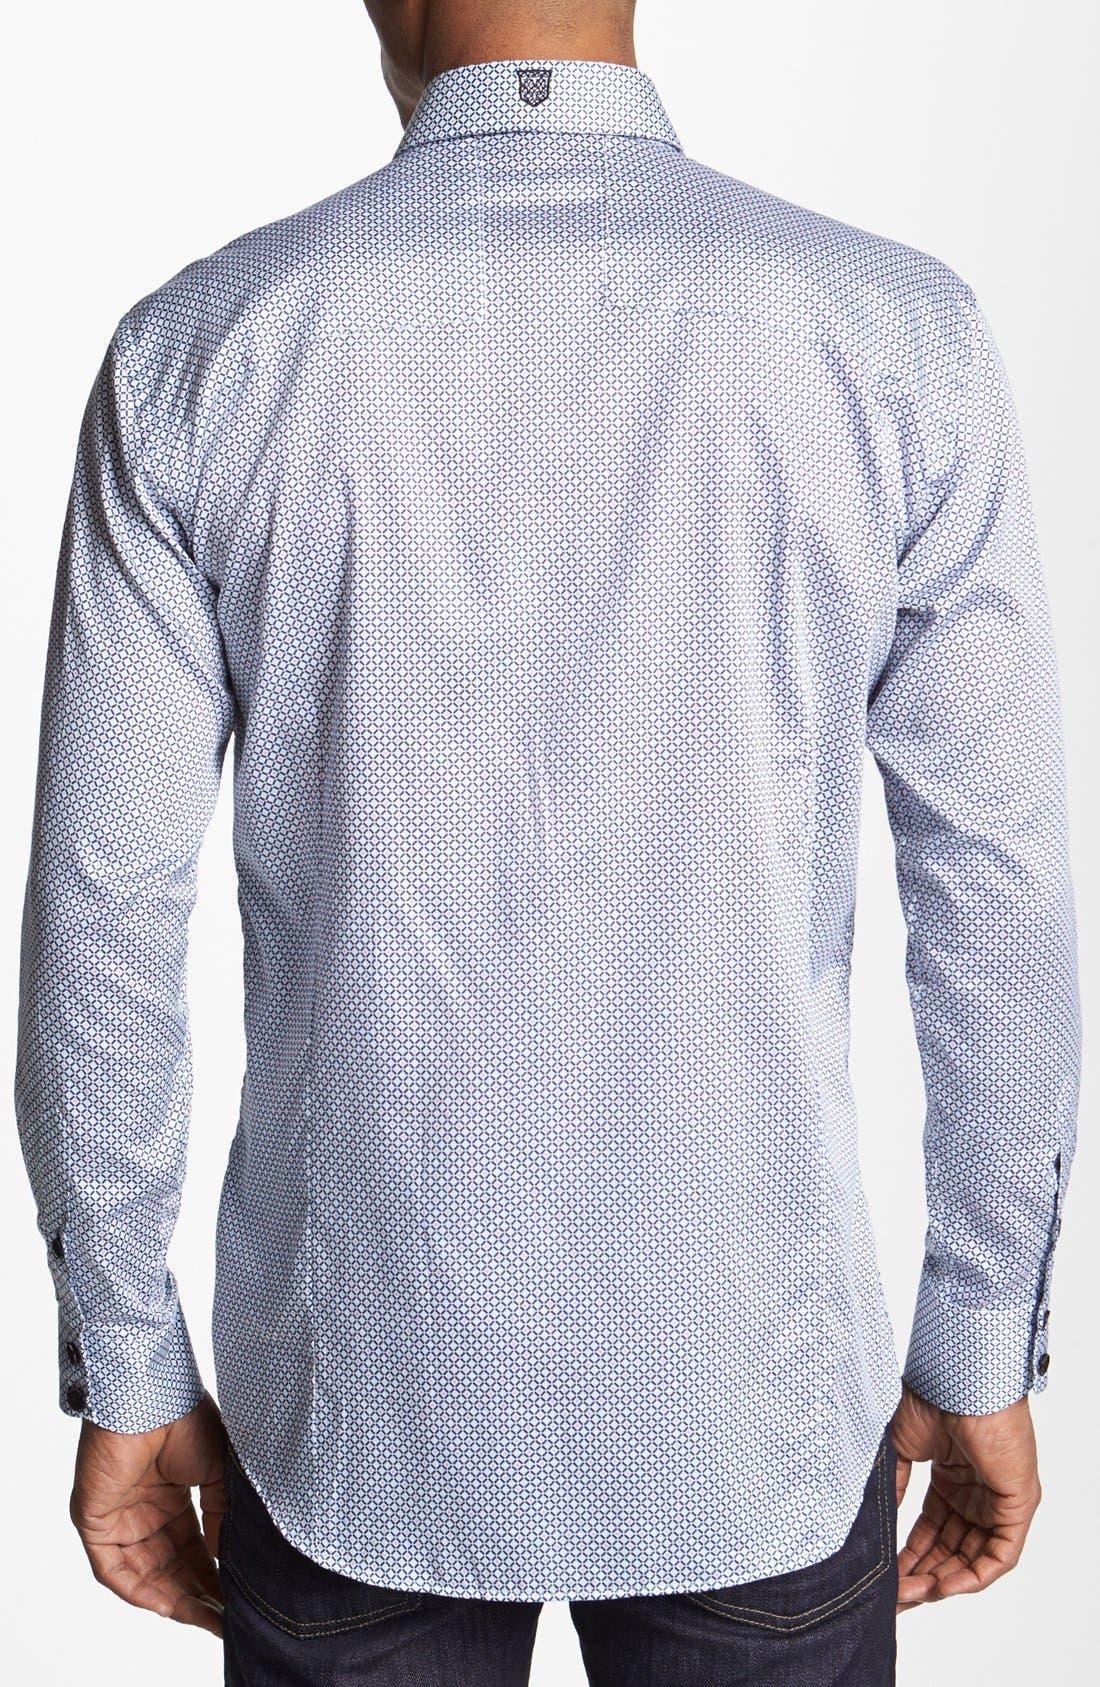 Alternate Image 2  - Bogosse 'Michael' Trim Fit Sport Shirt